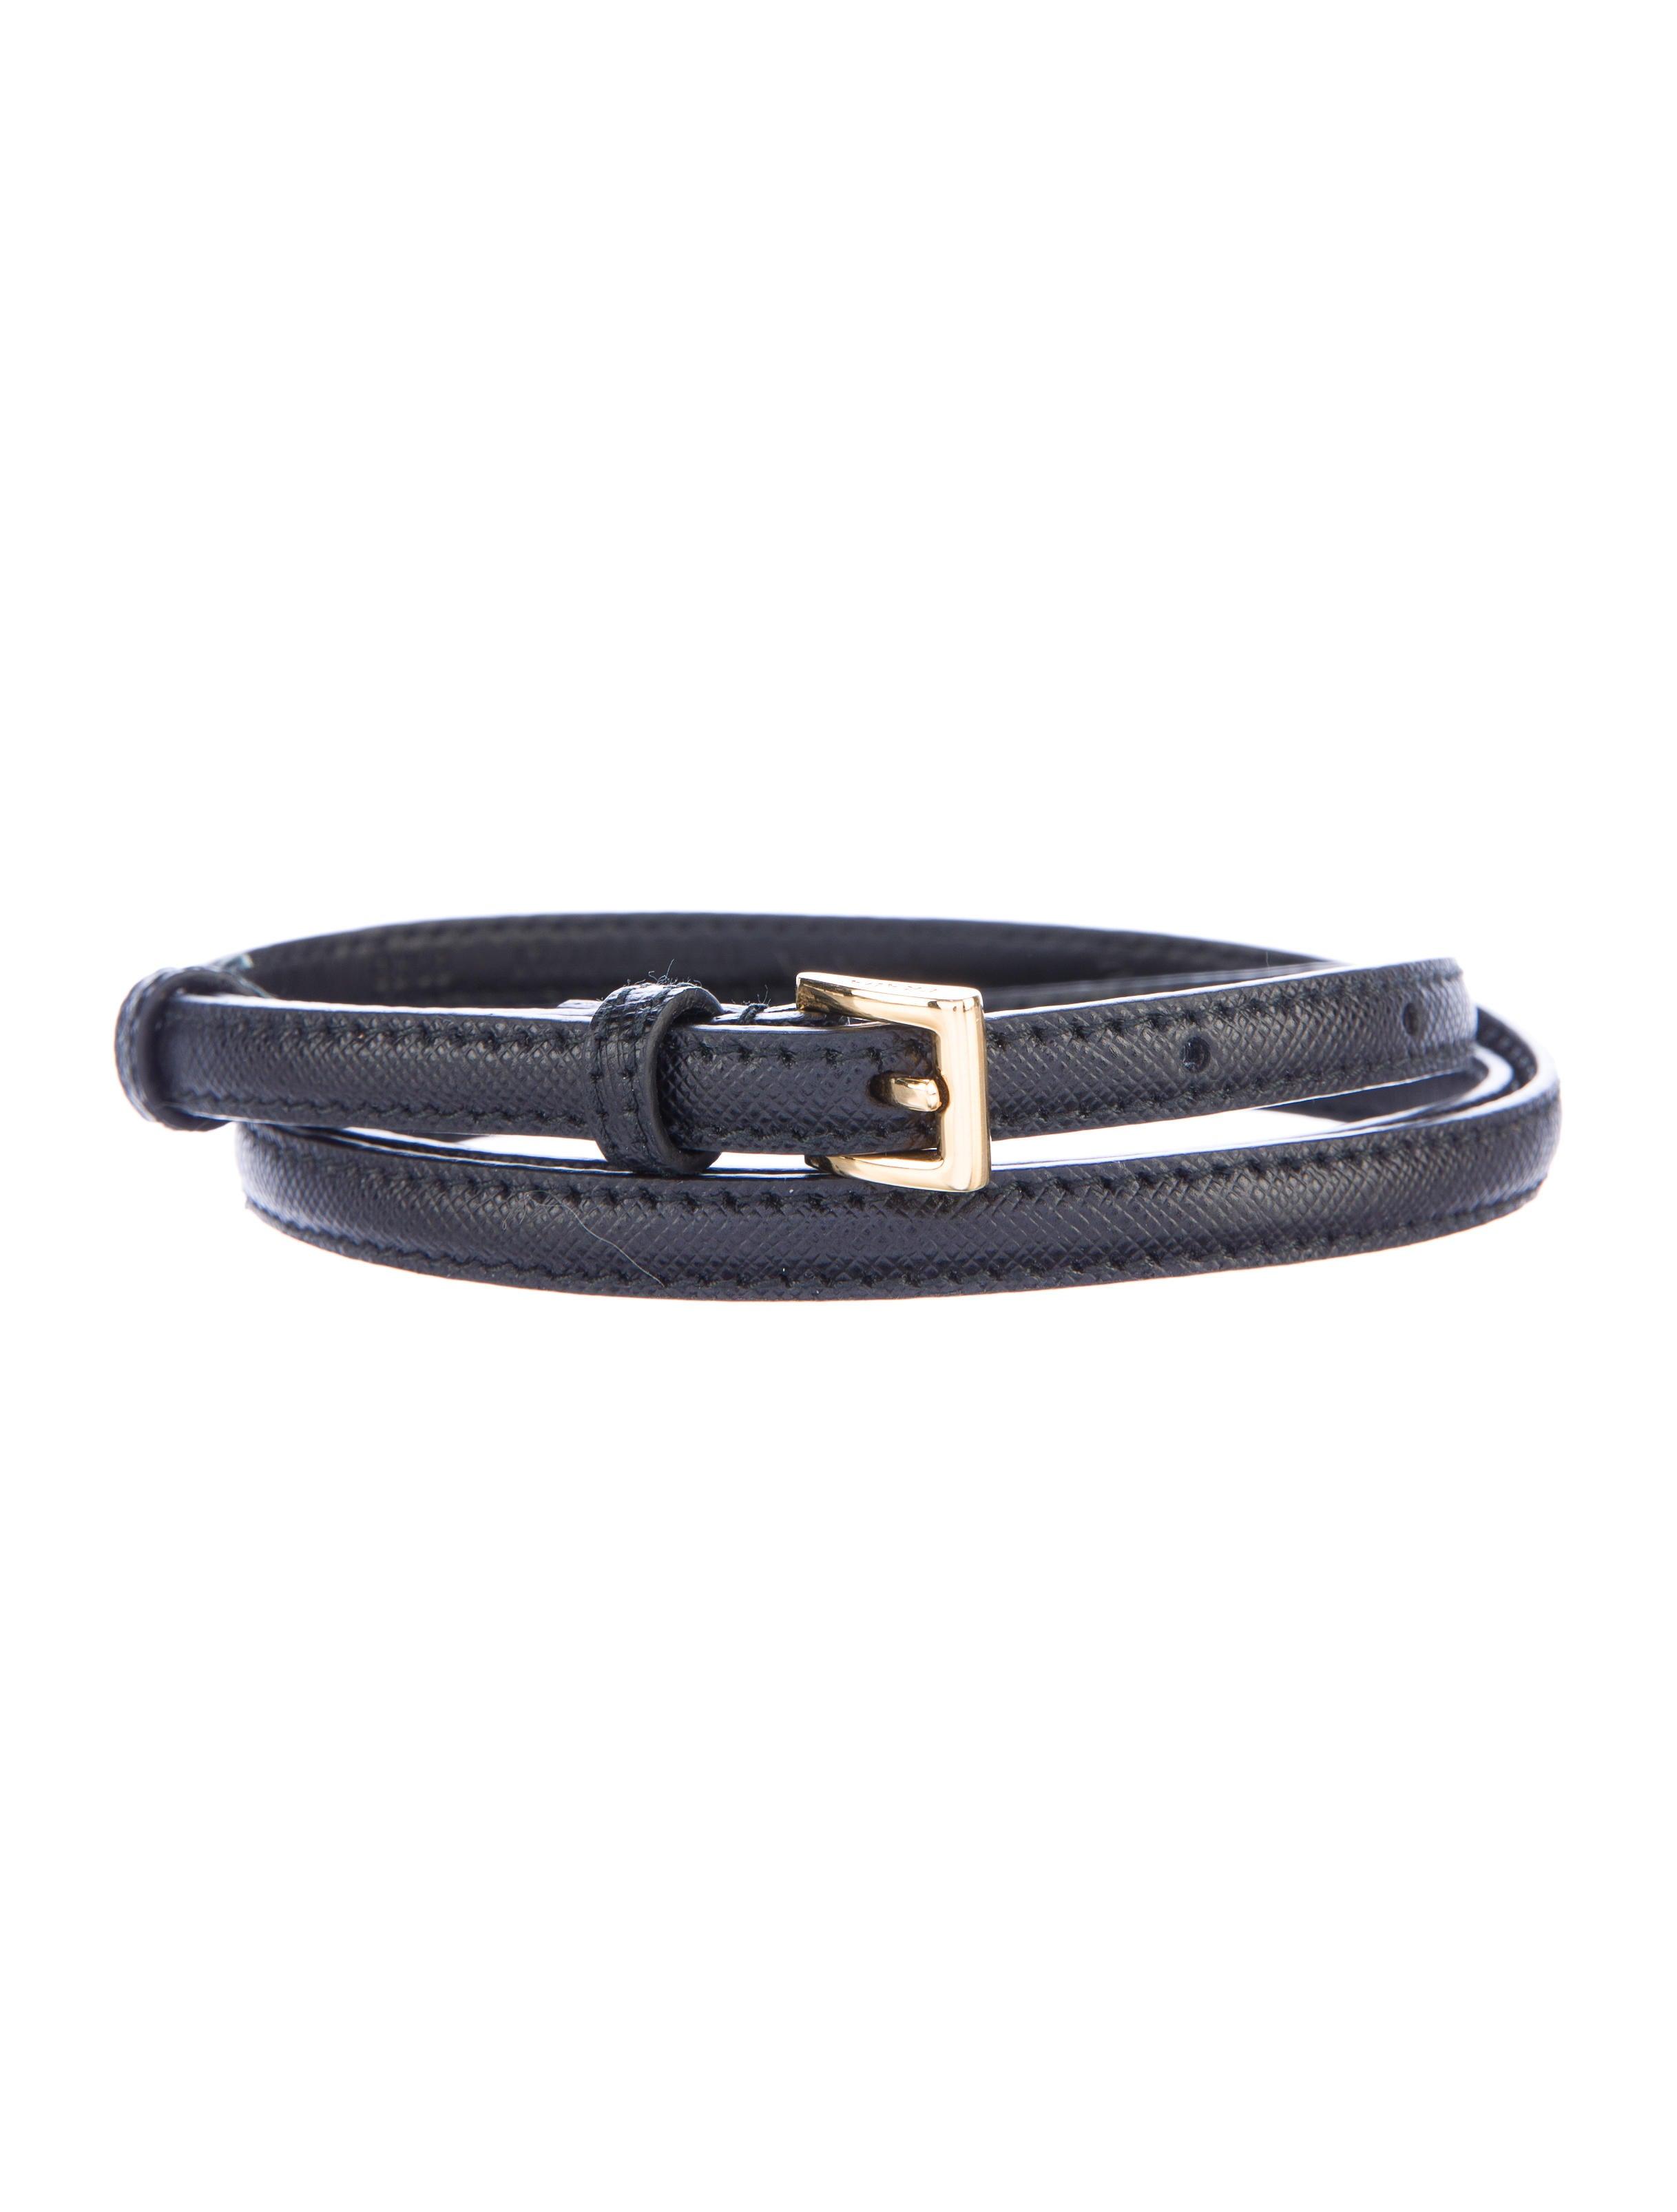 prada saffiano leather belt accessories